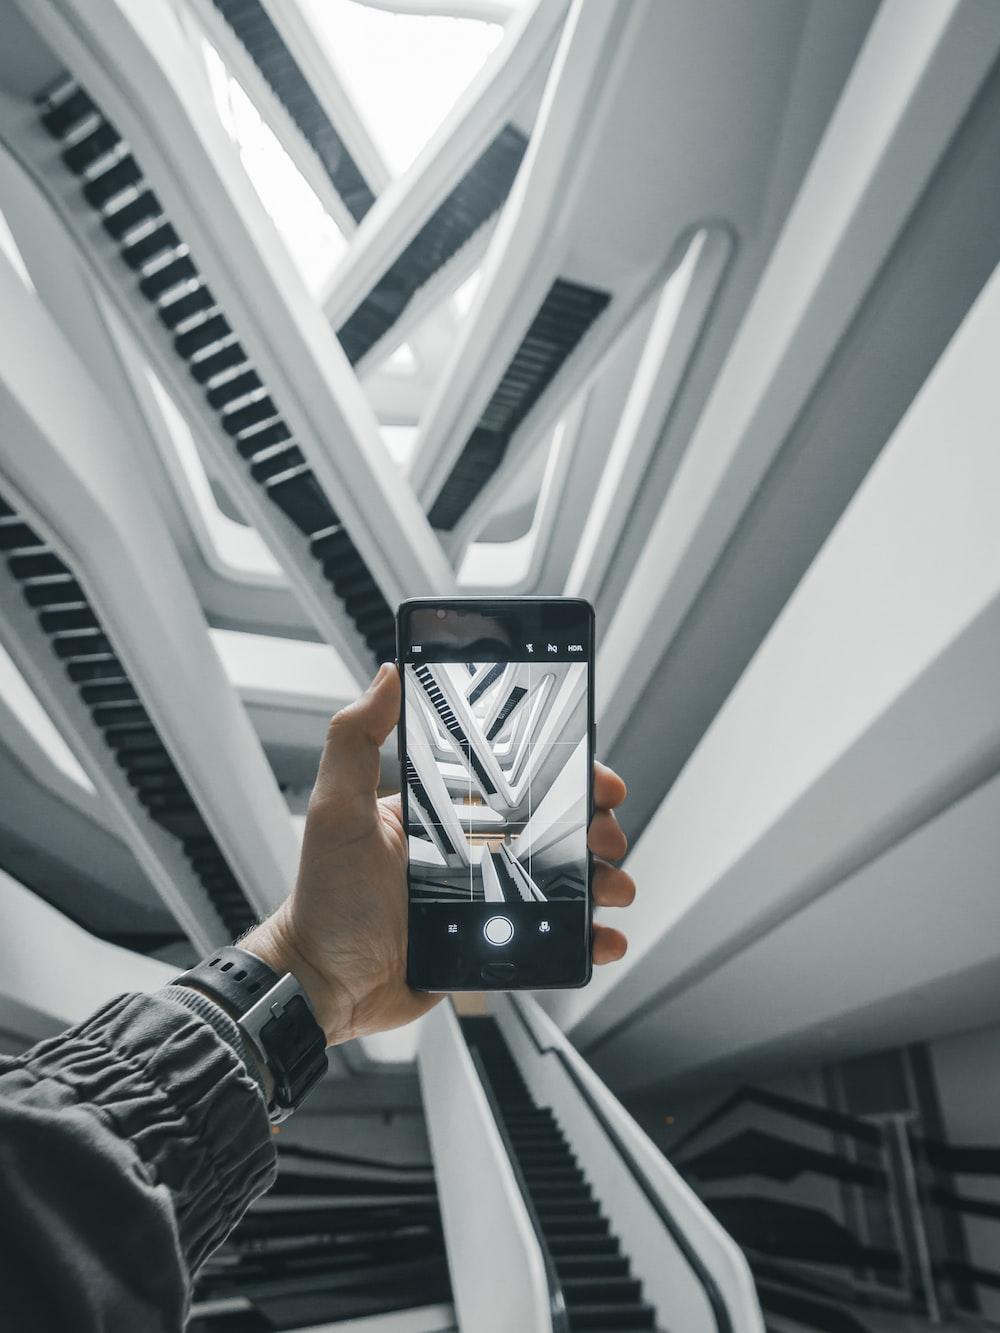 person taking a photo of escalators in building